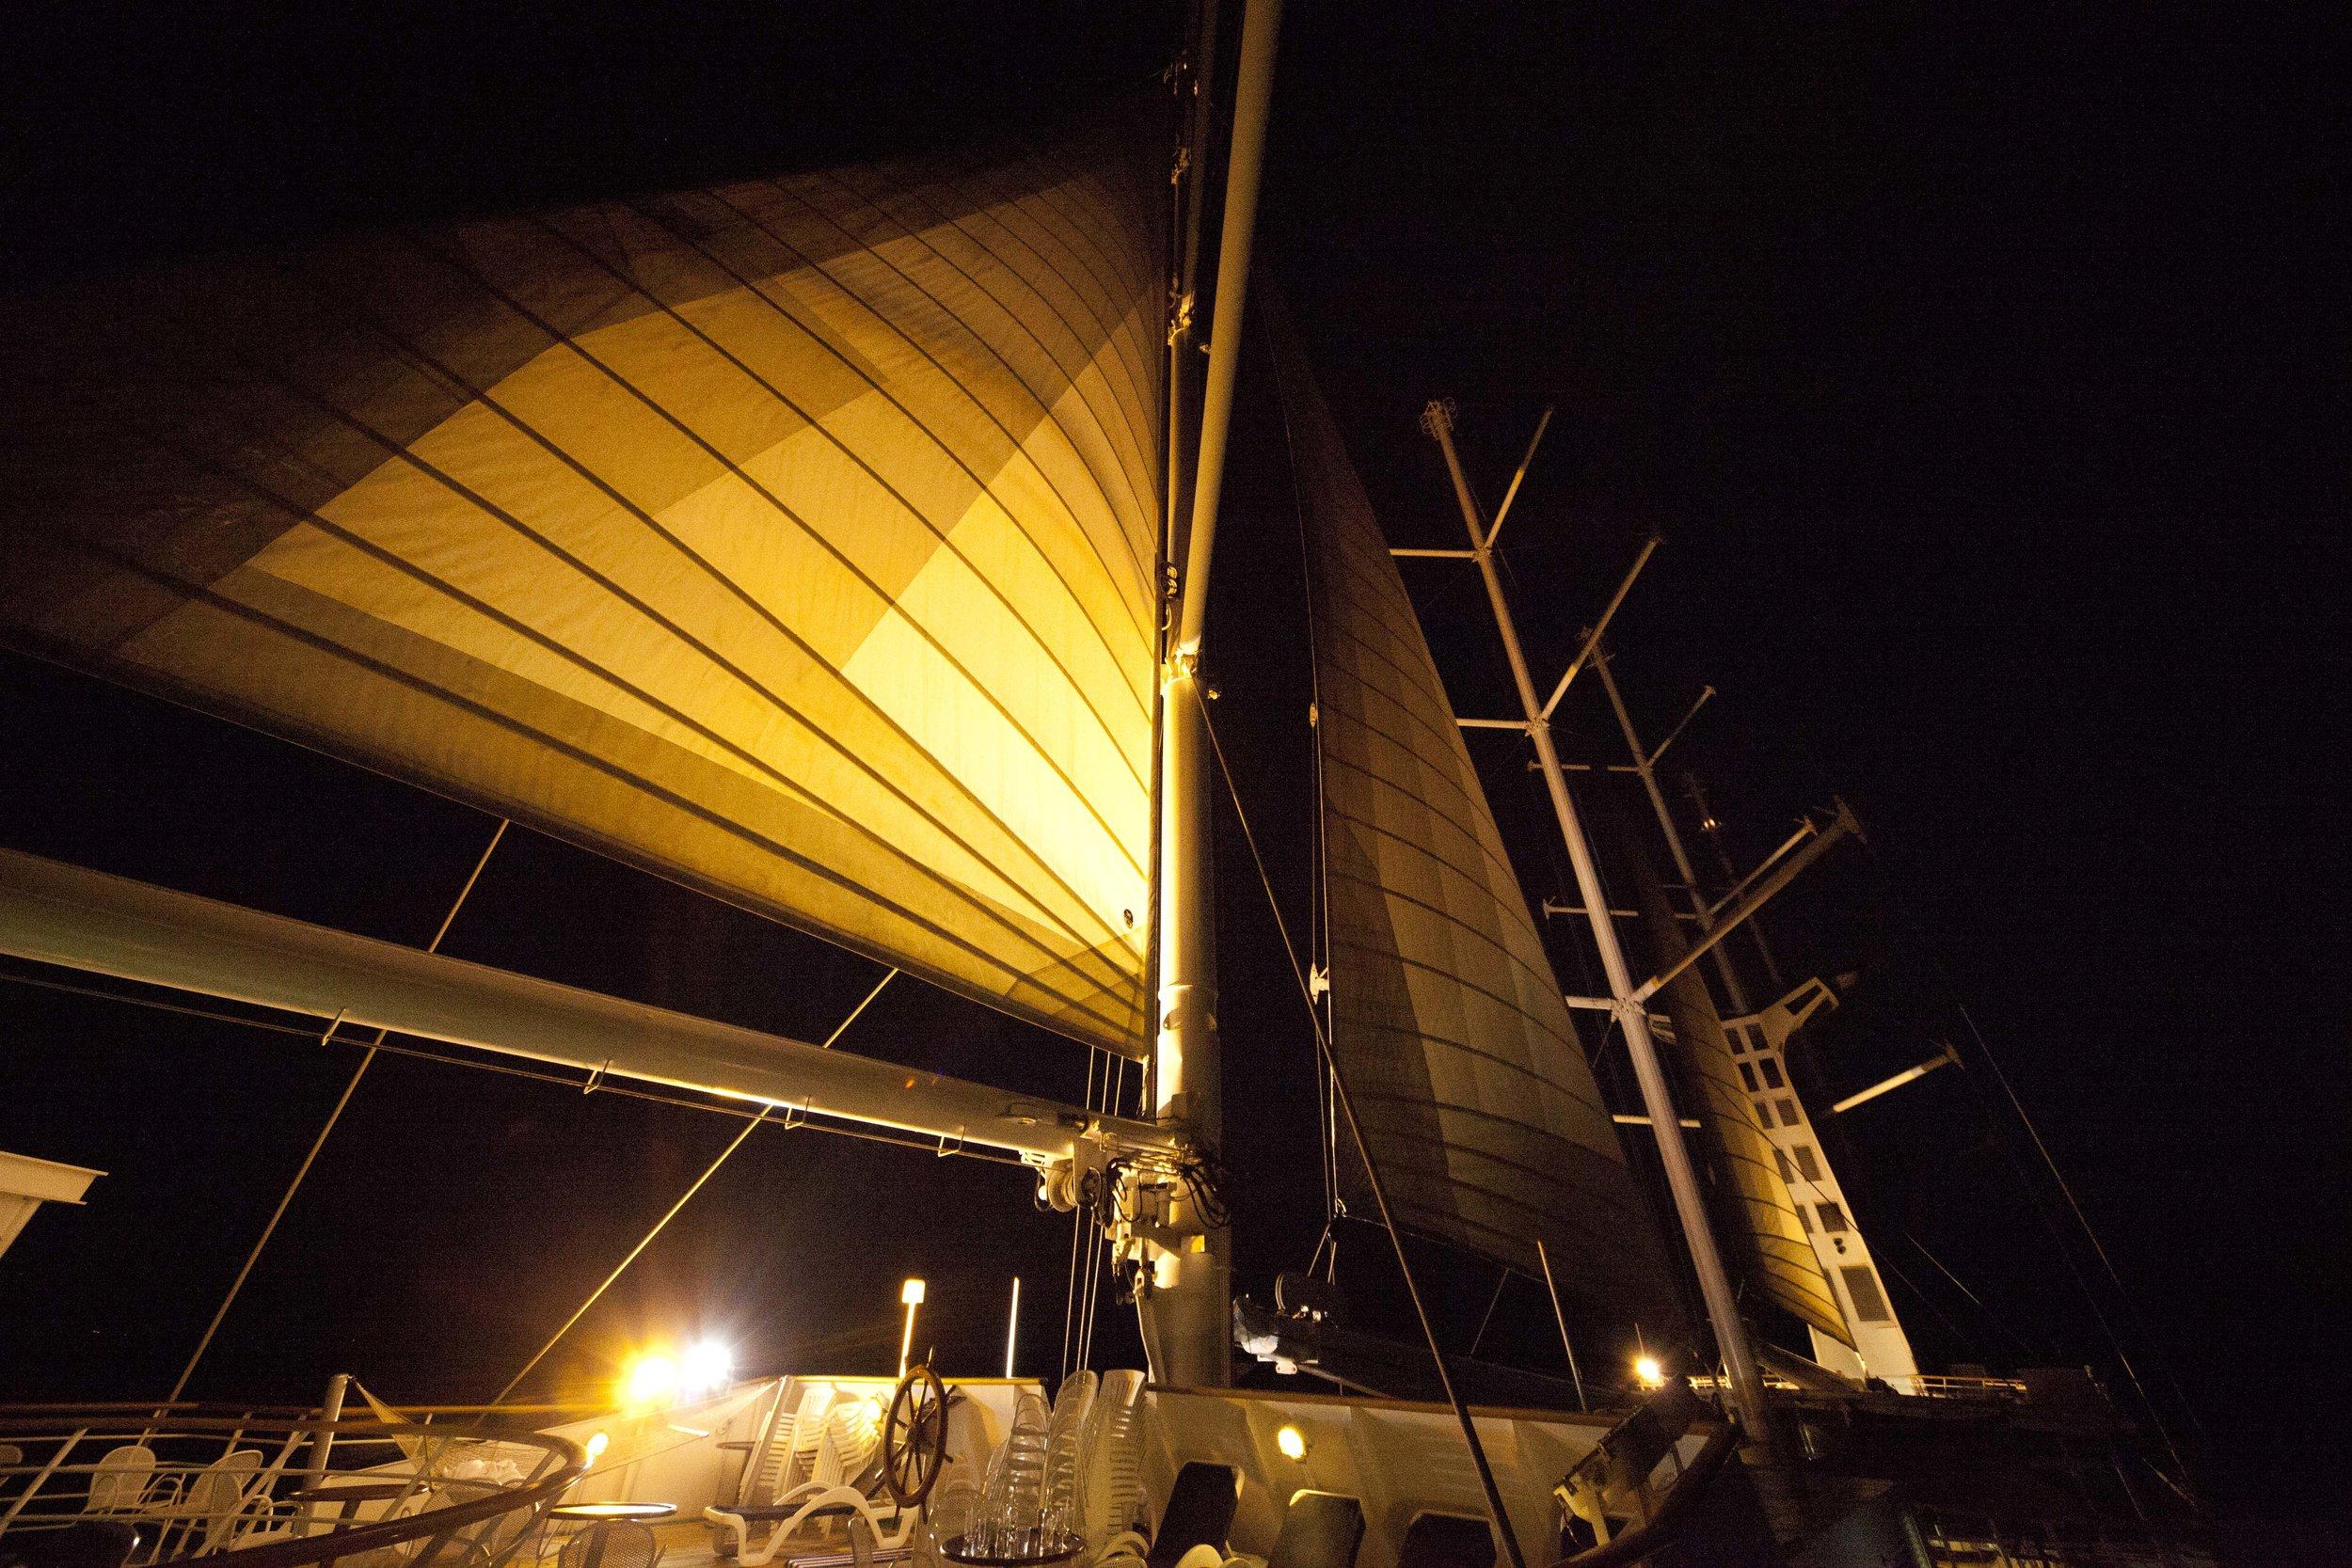 O_sails_045.jpg